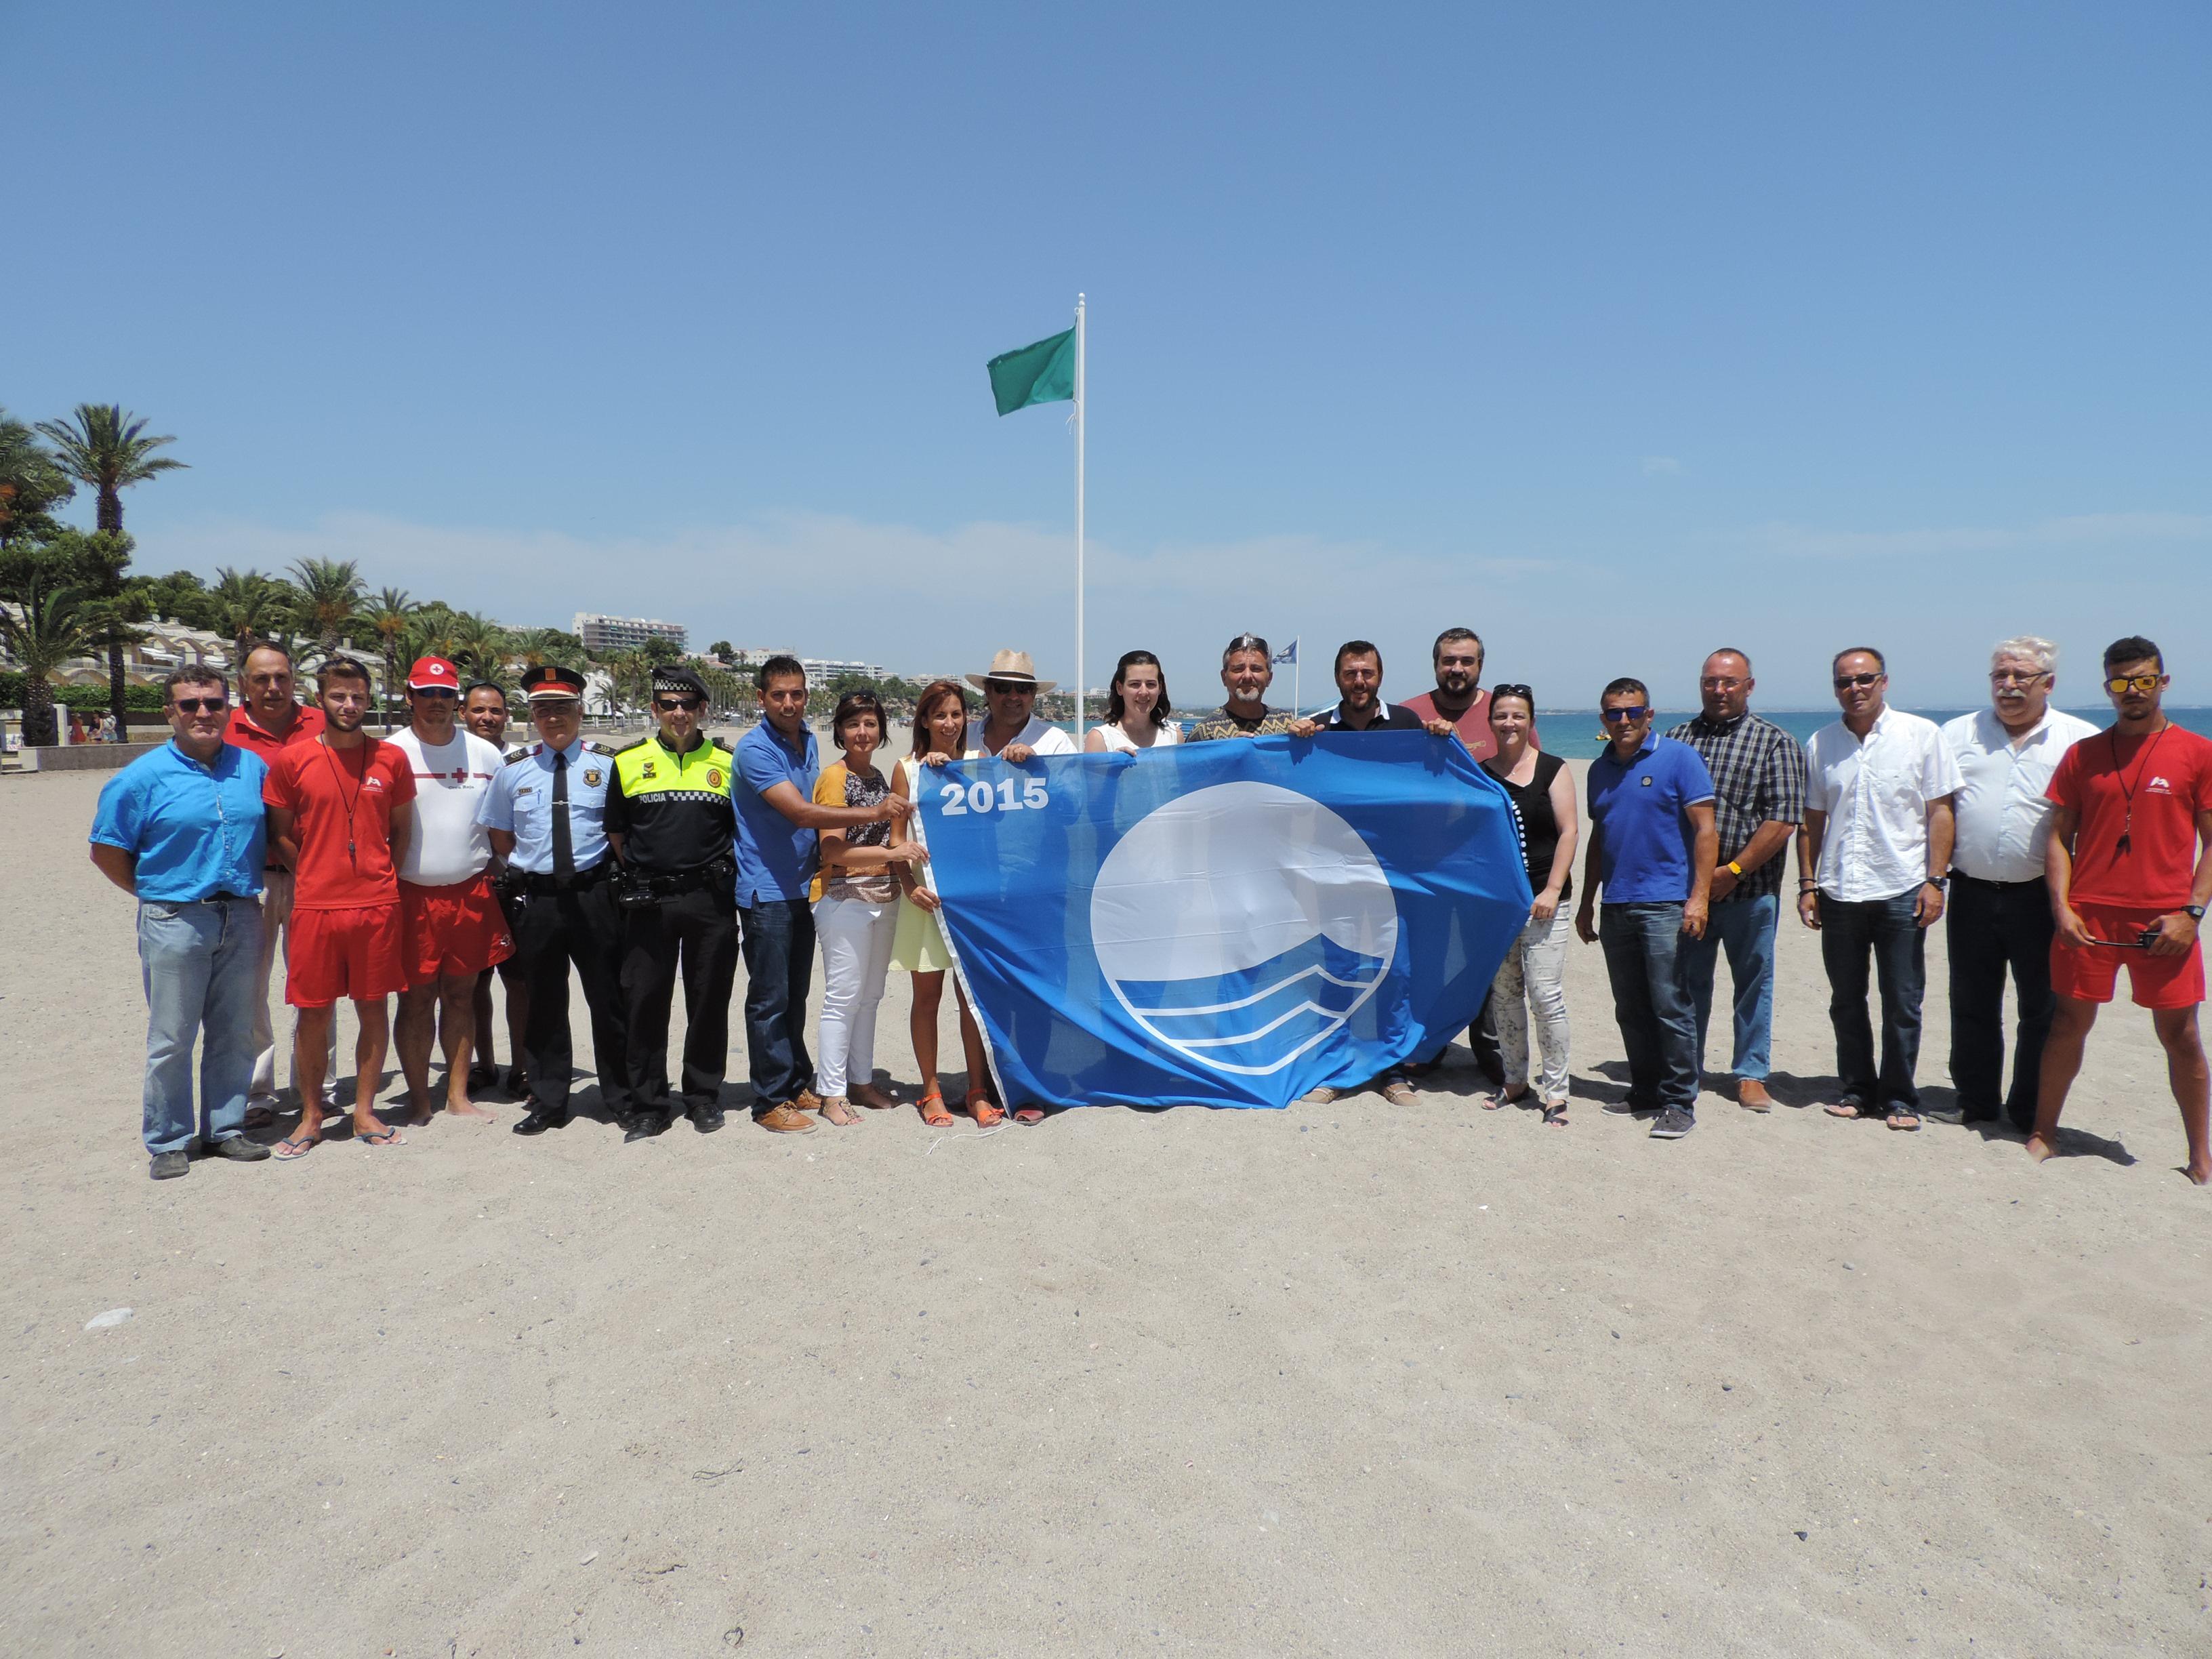 Bandera Blava 2015 a la platja Cristall